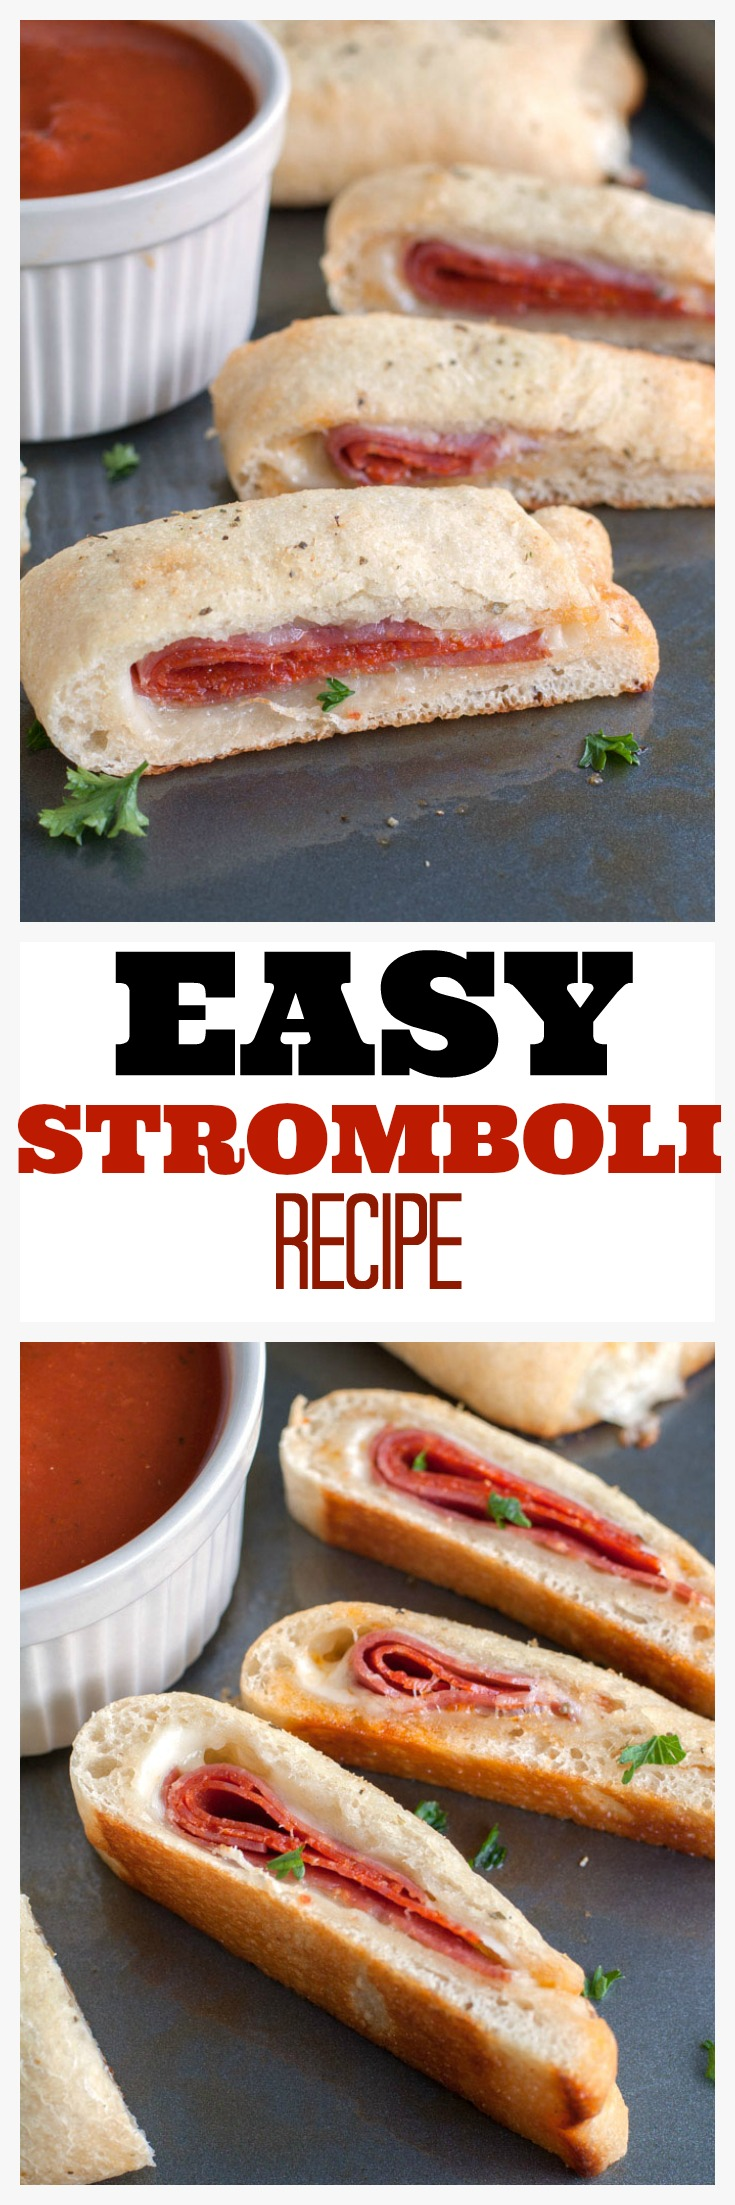 easy stromboli recipe PIN